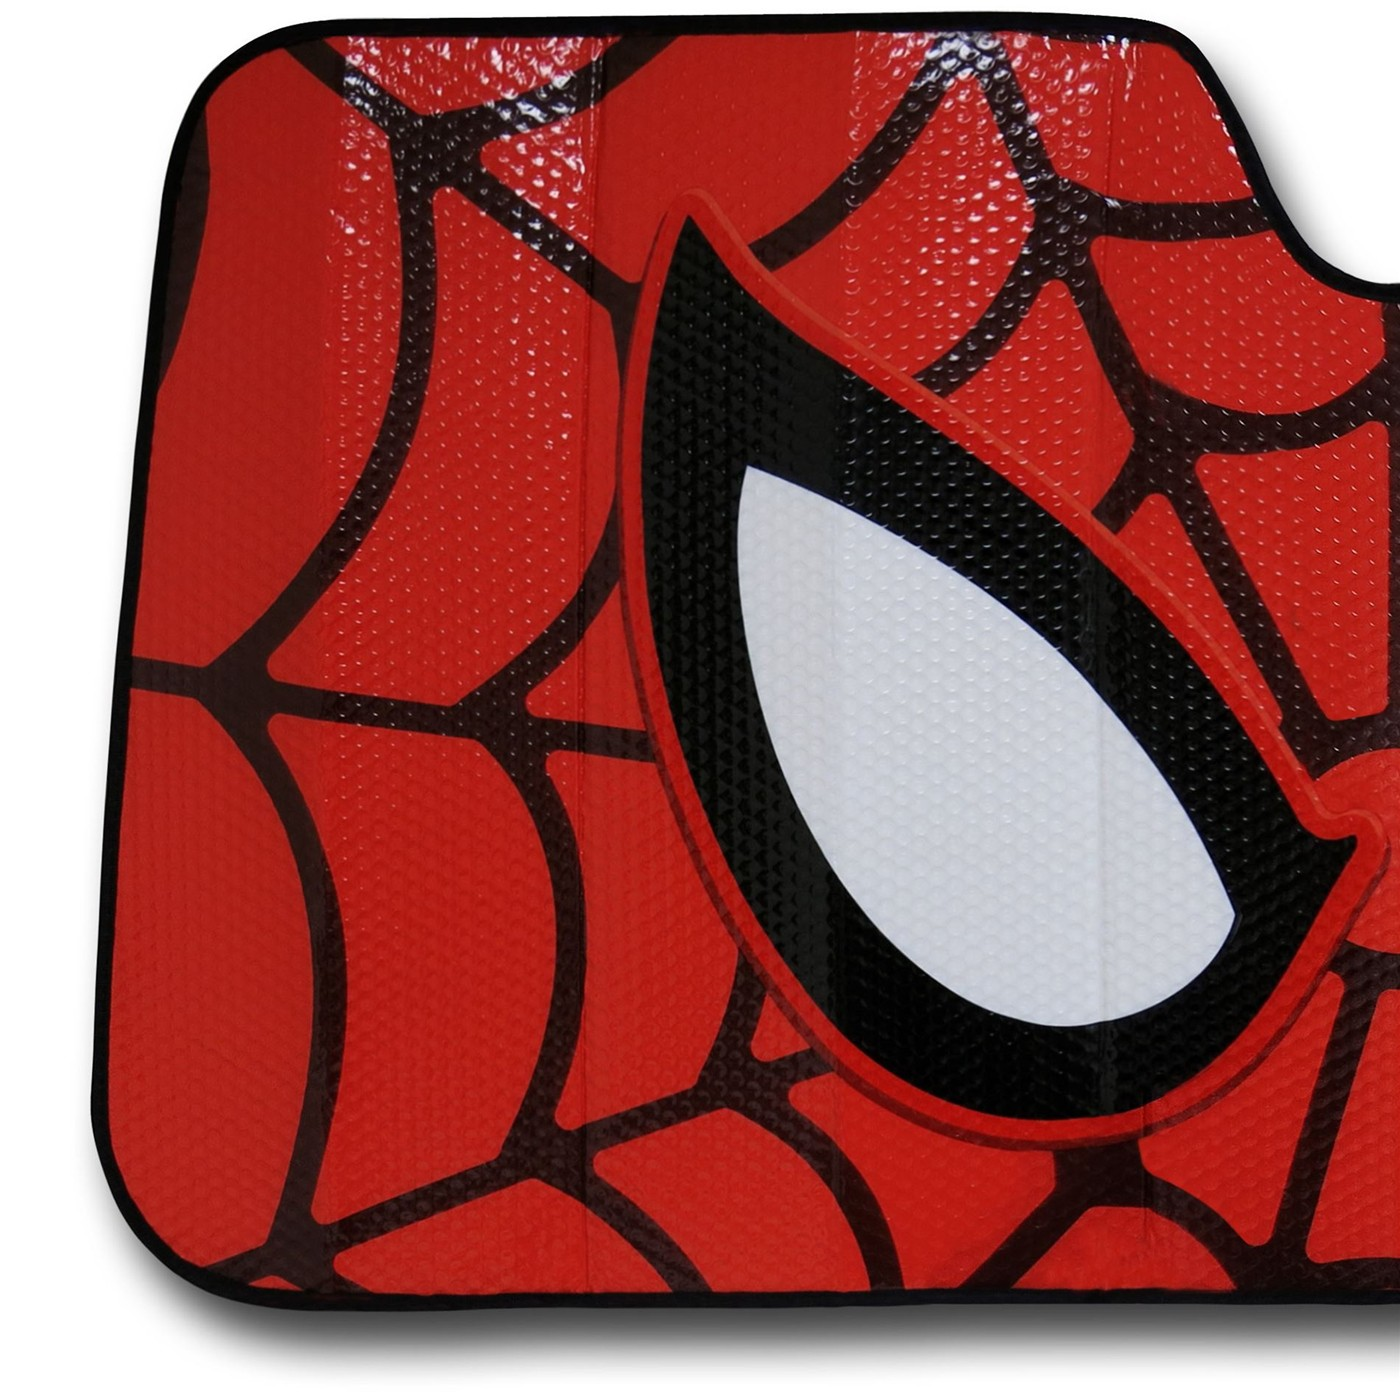 Spiderman Mask Car Sunshade